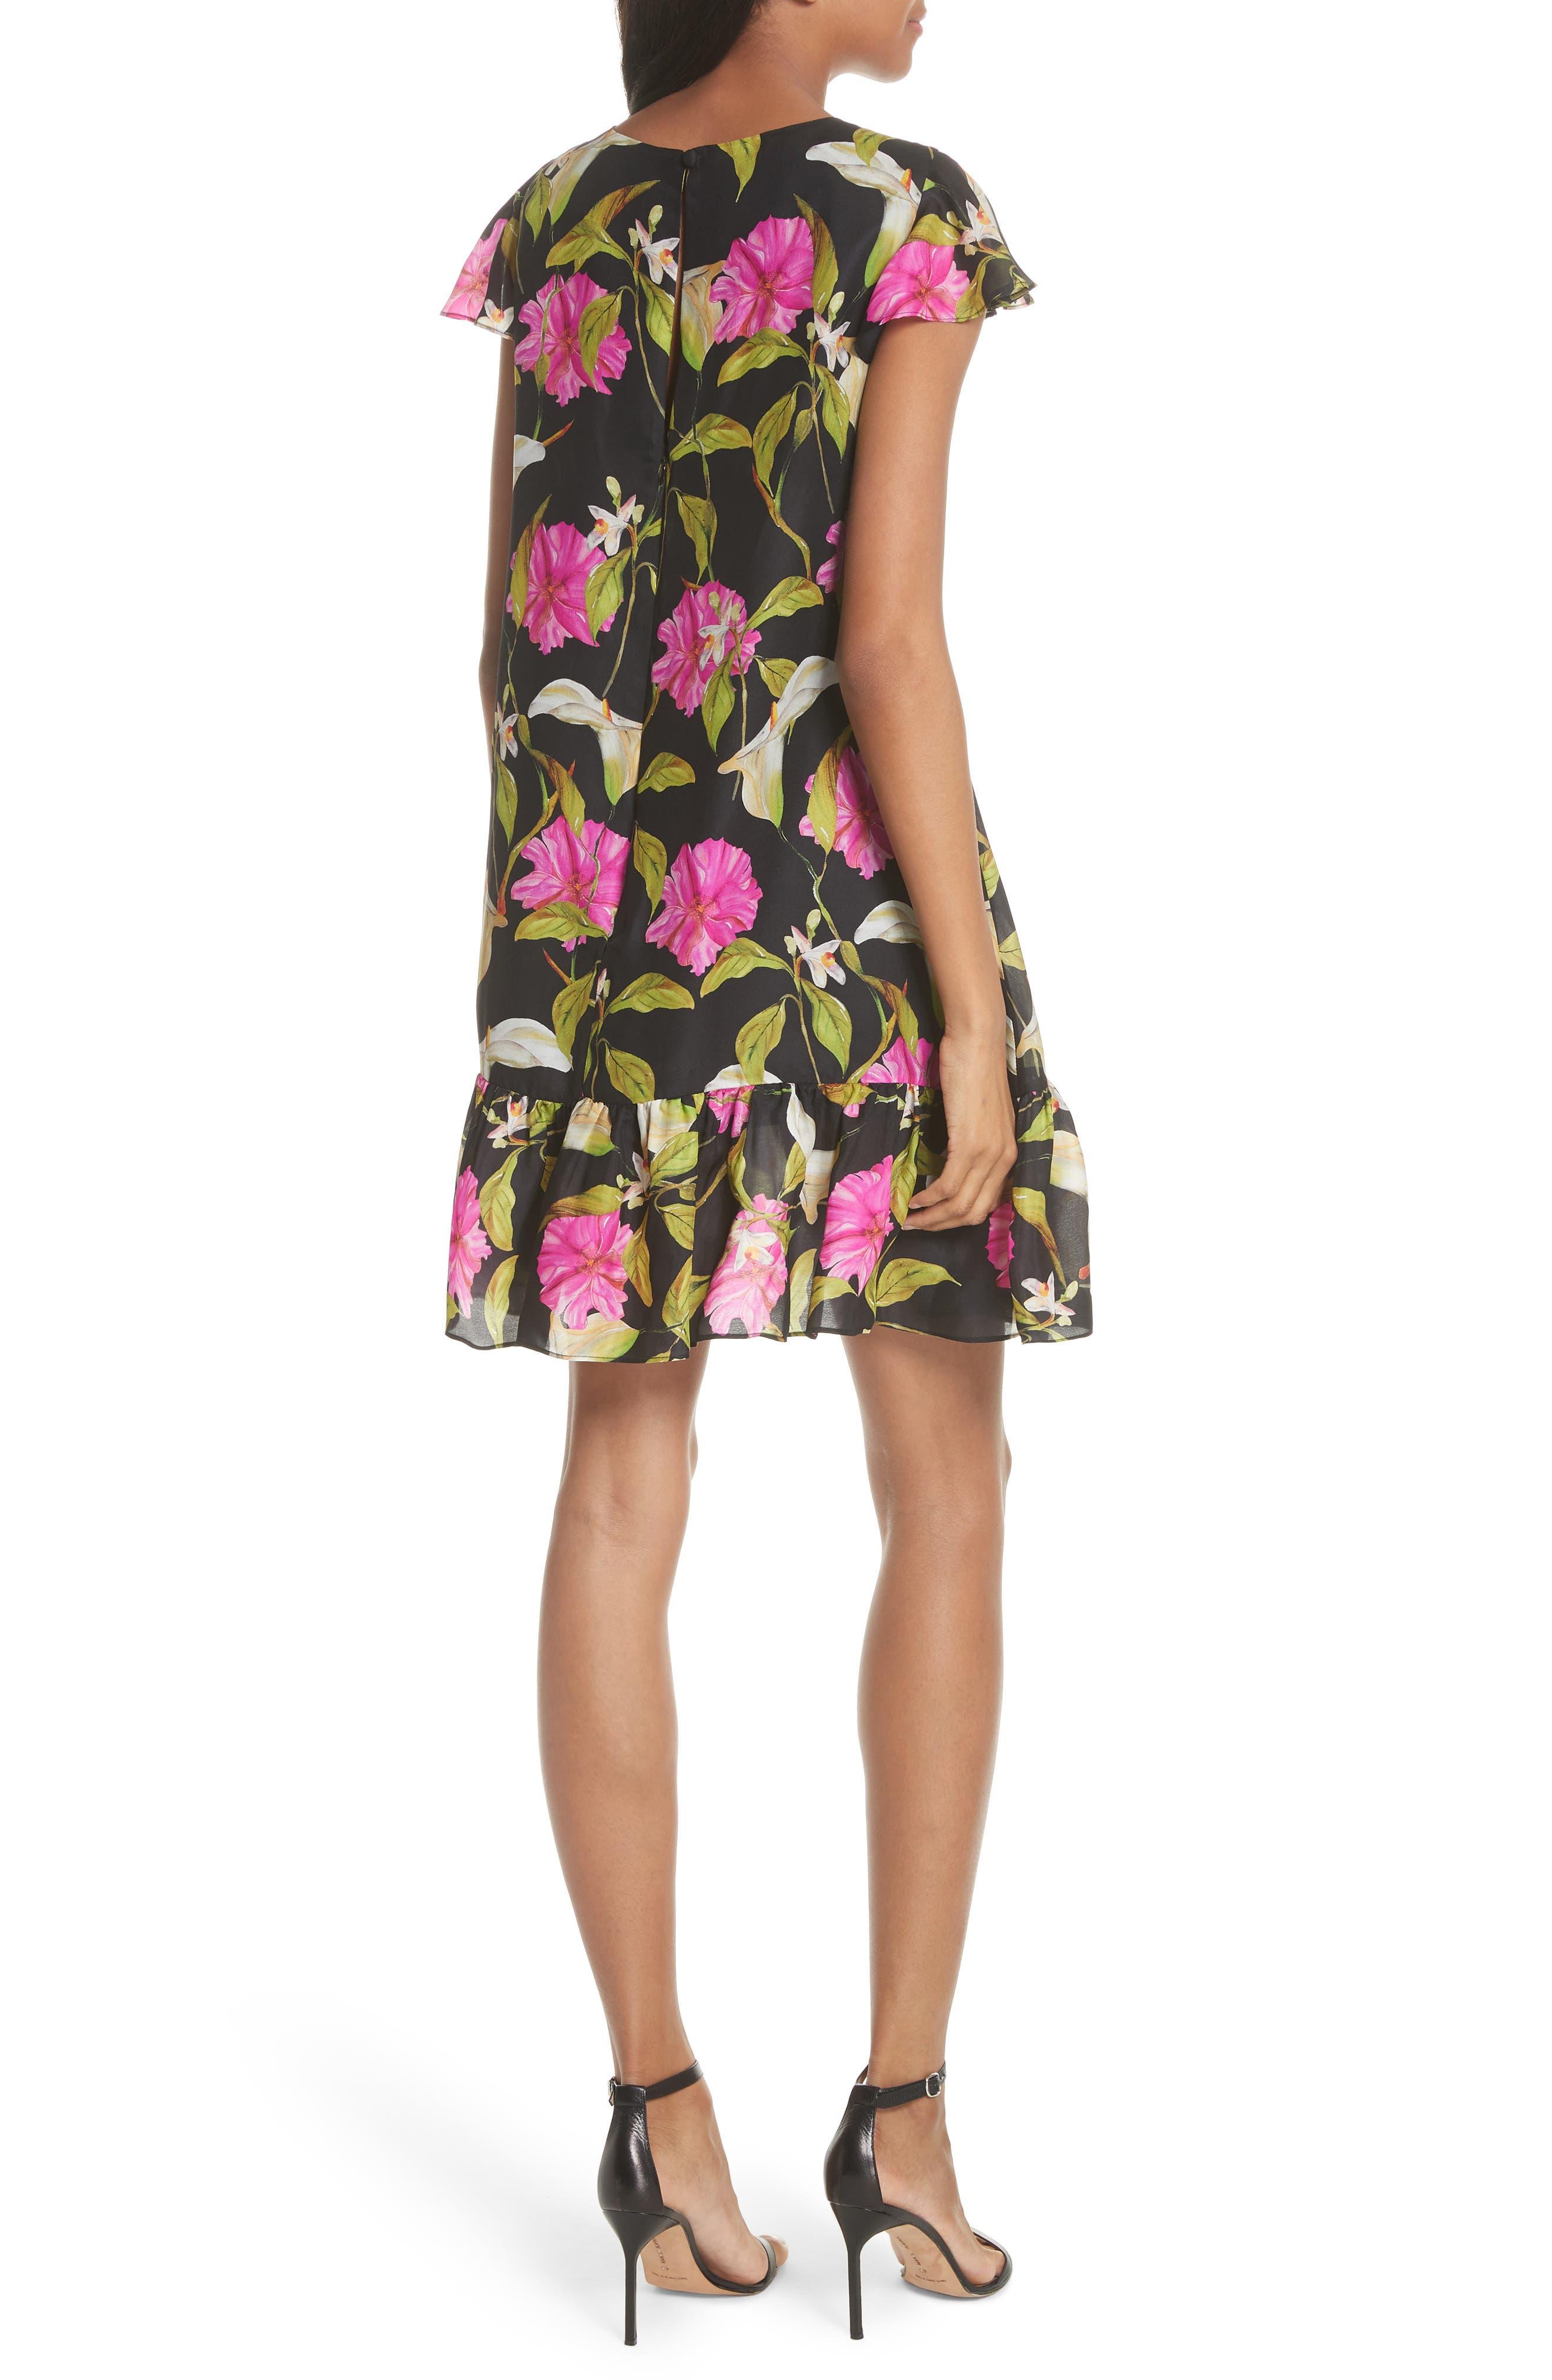 Jill Large Calla Lily Shift Dress,                             Alternate thumbnail 2, color,                             004